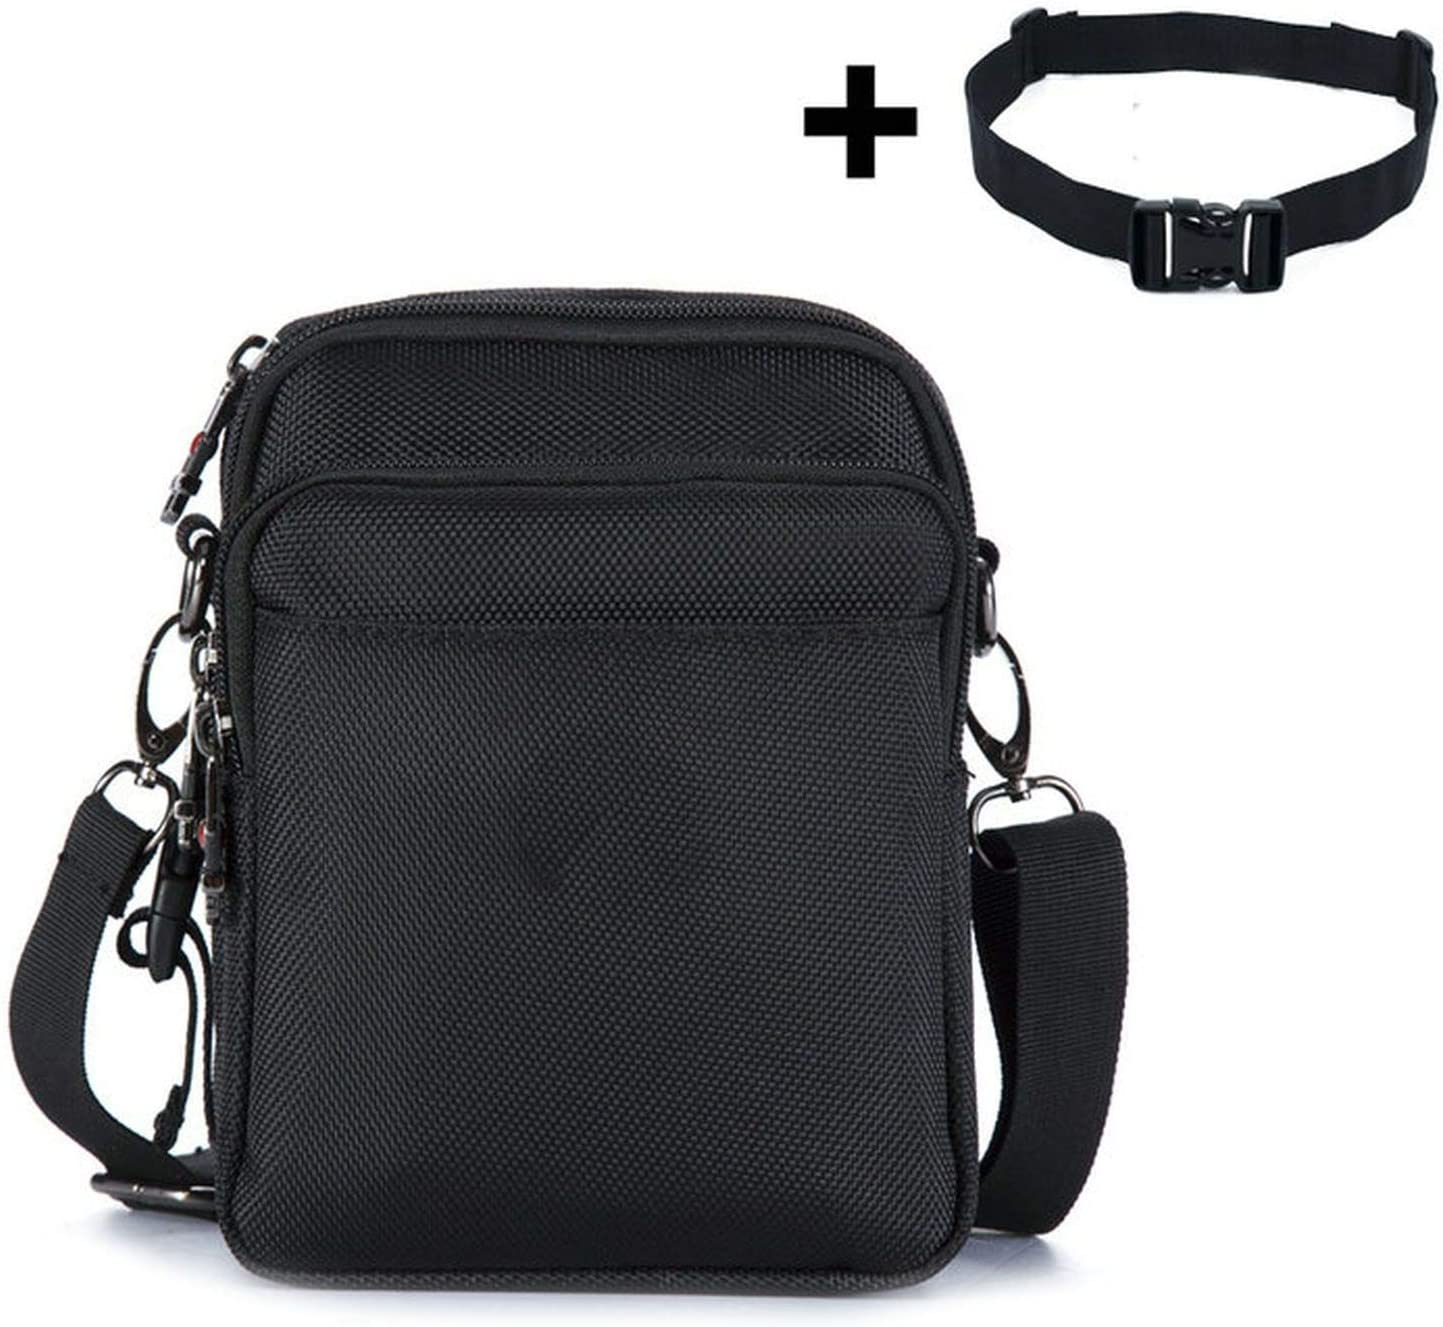 Mens Messenger Bag Waterproof Men Belt Bag Zipper Bag,New Size